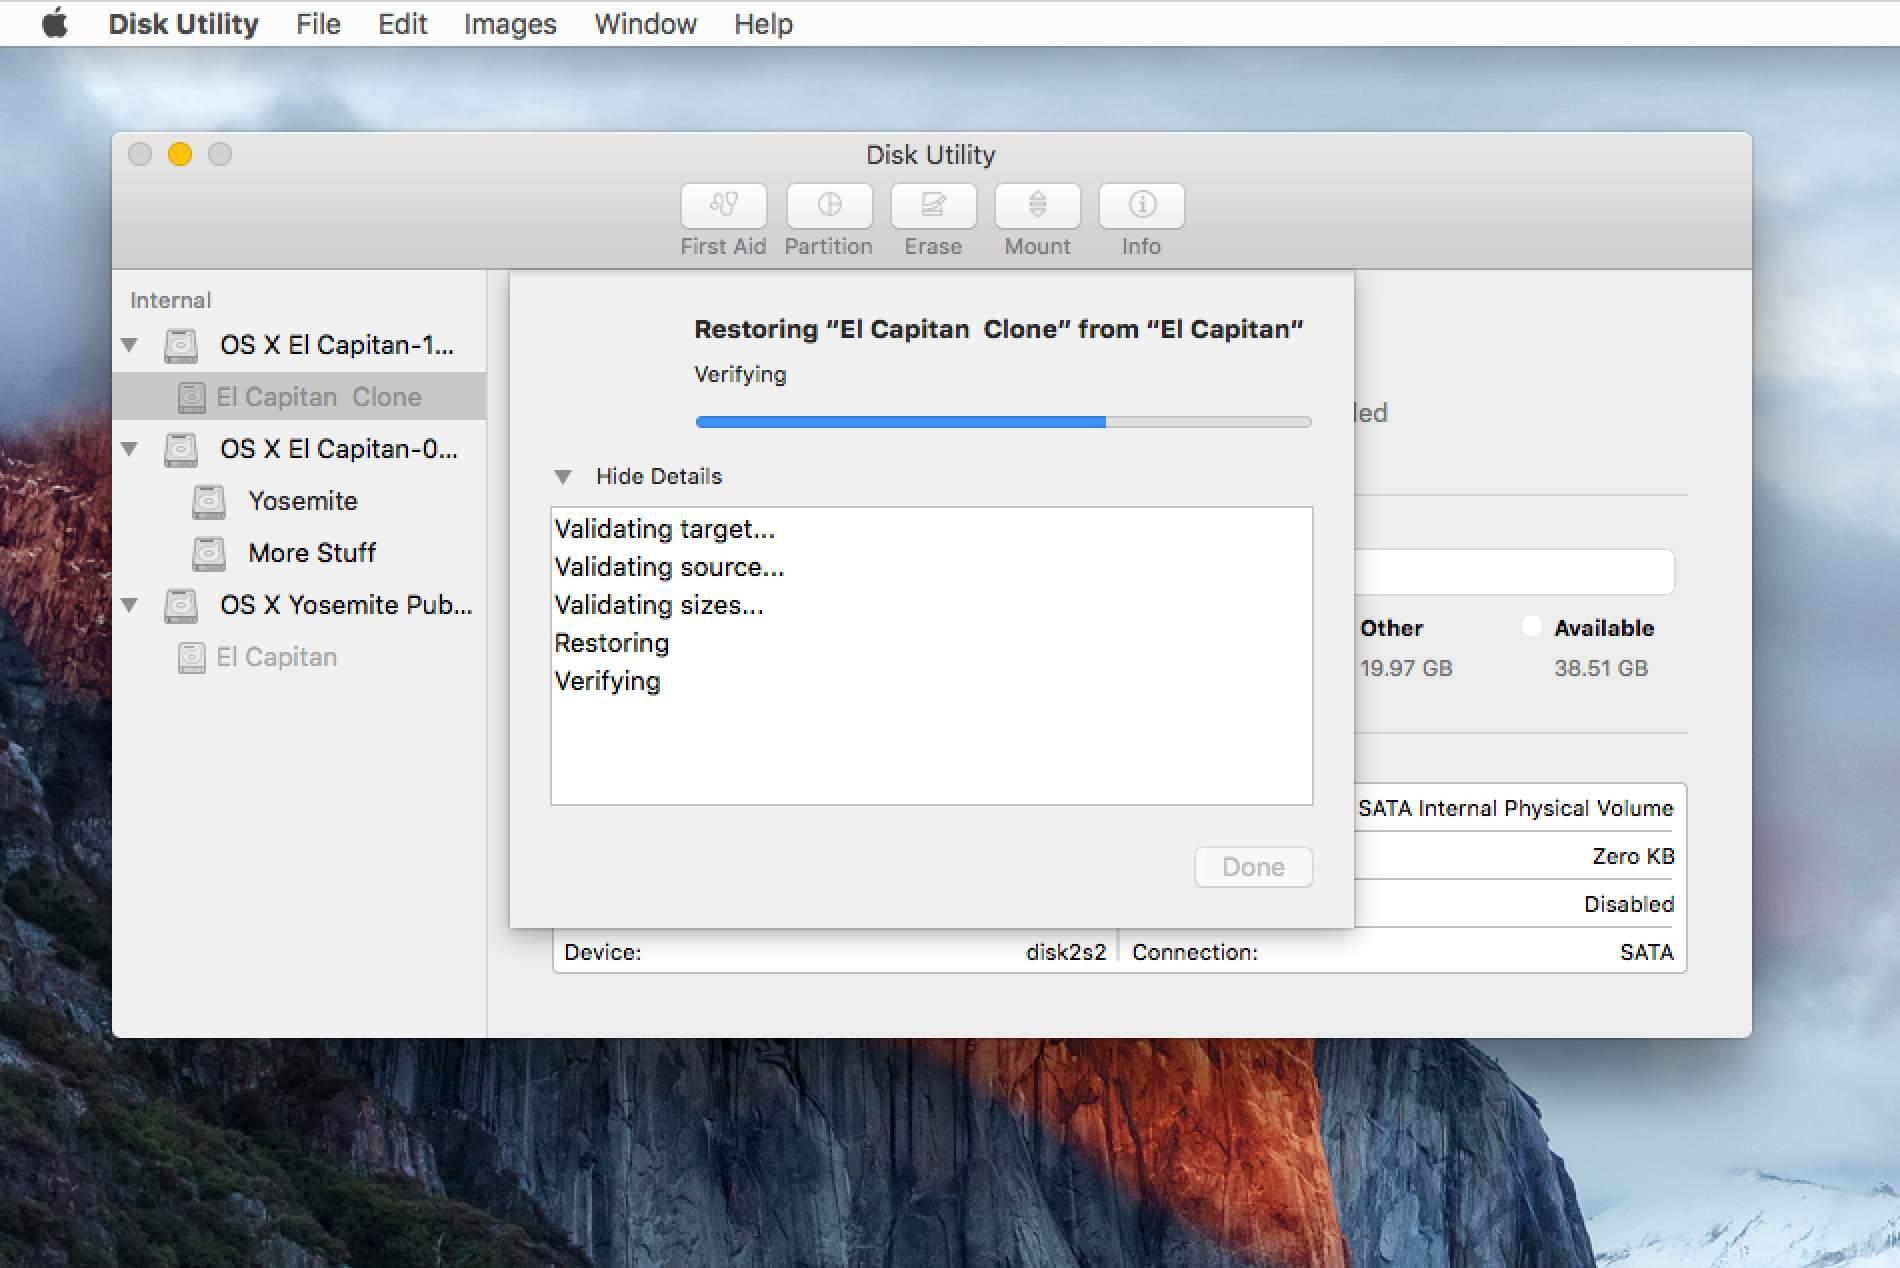 Disk Utility Restore process details in OS X El Capitan